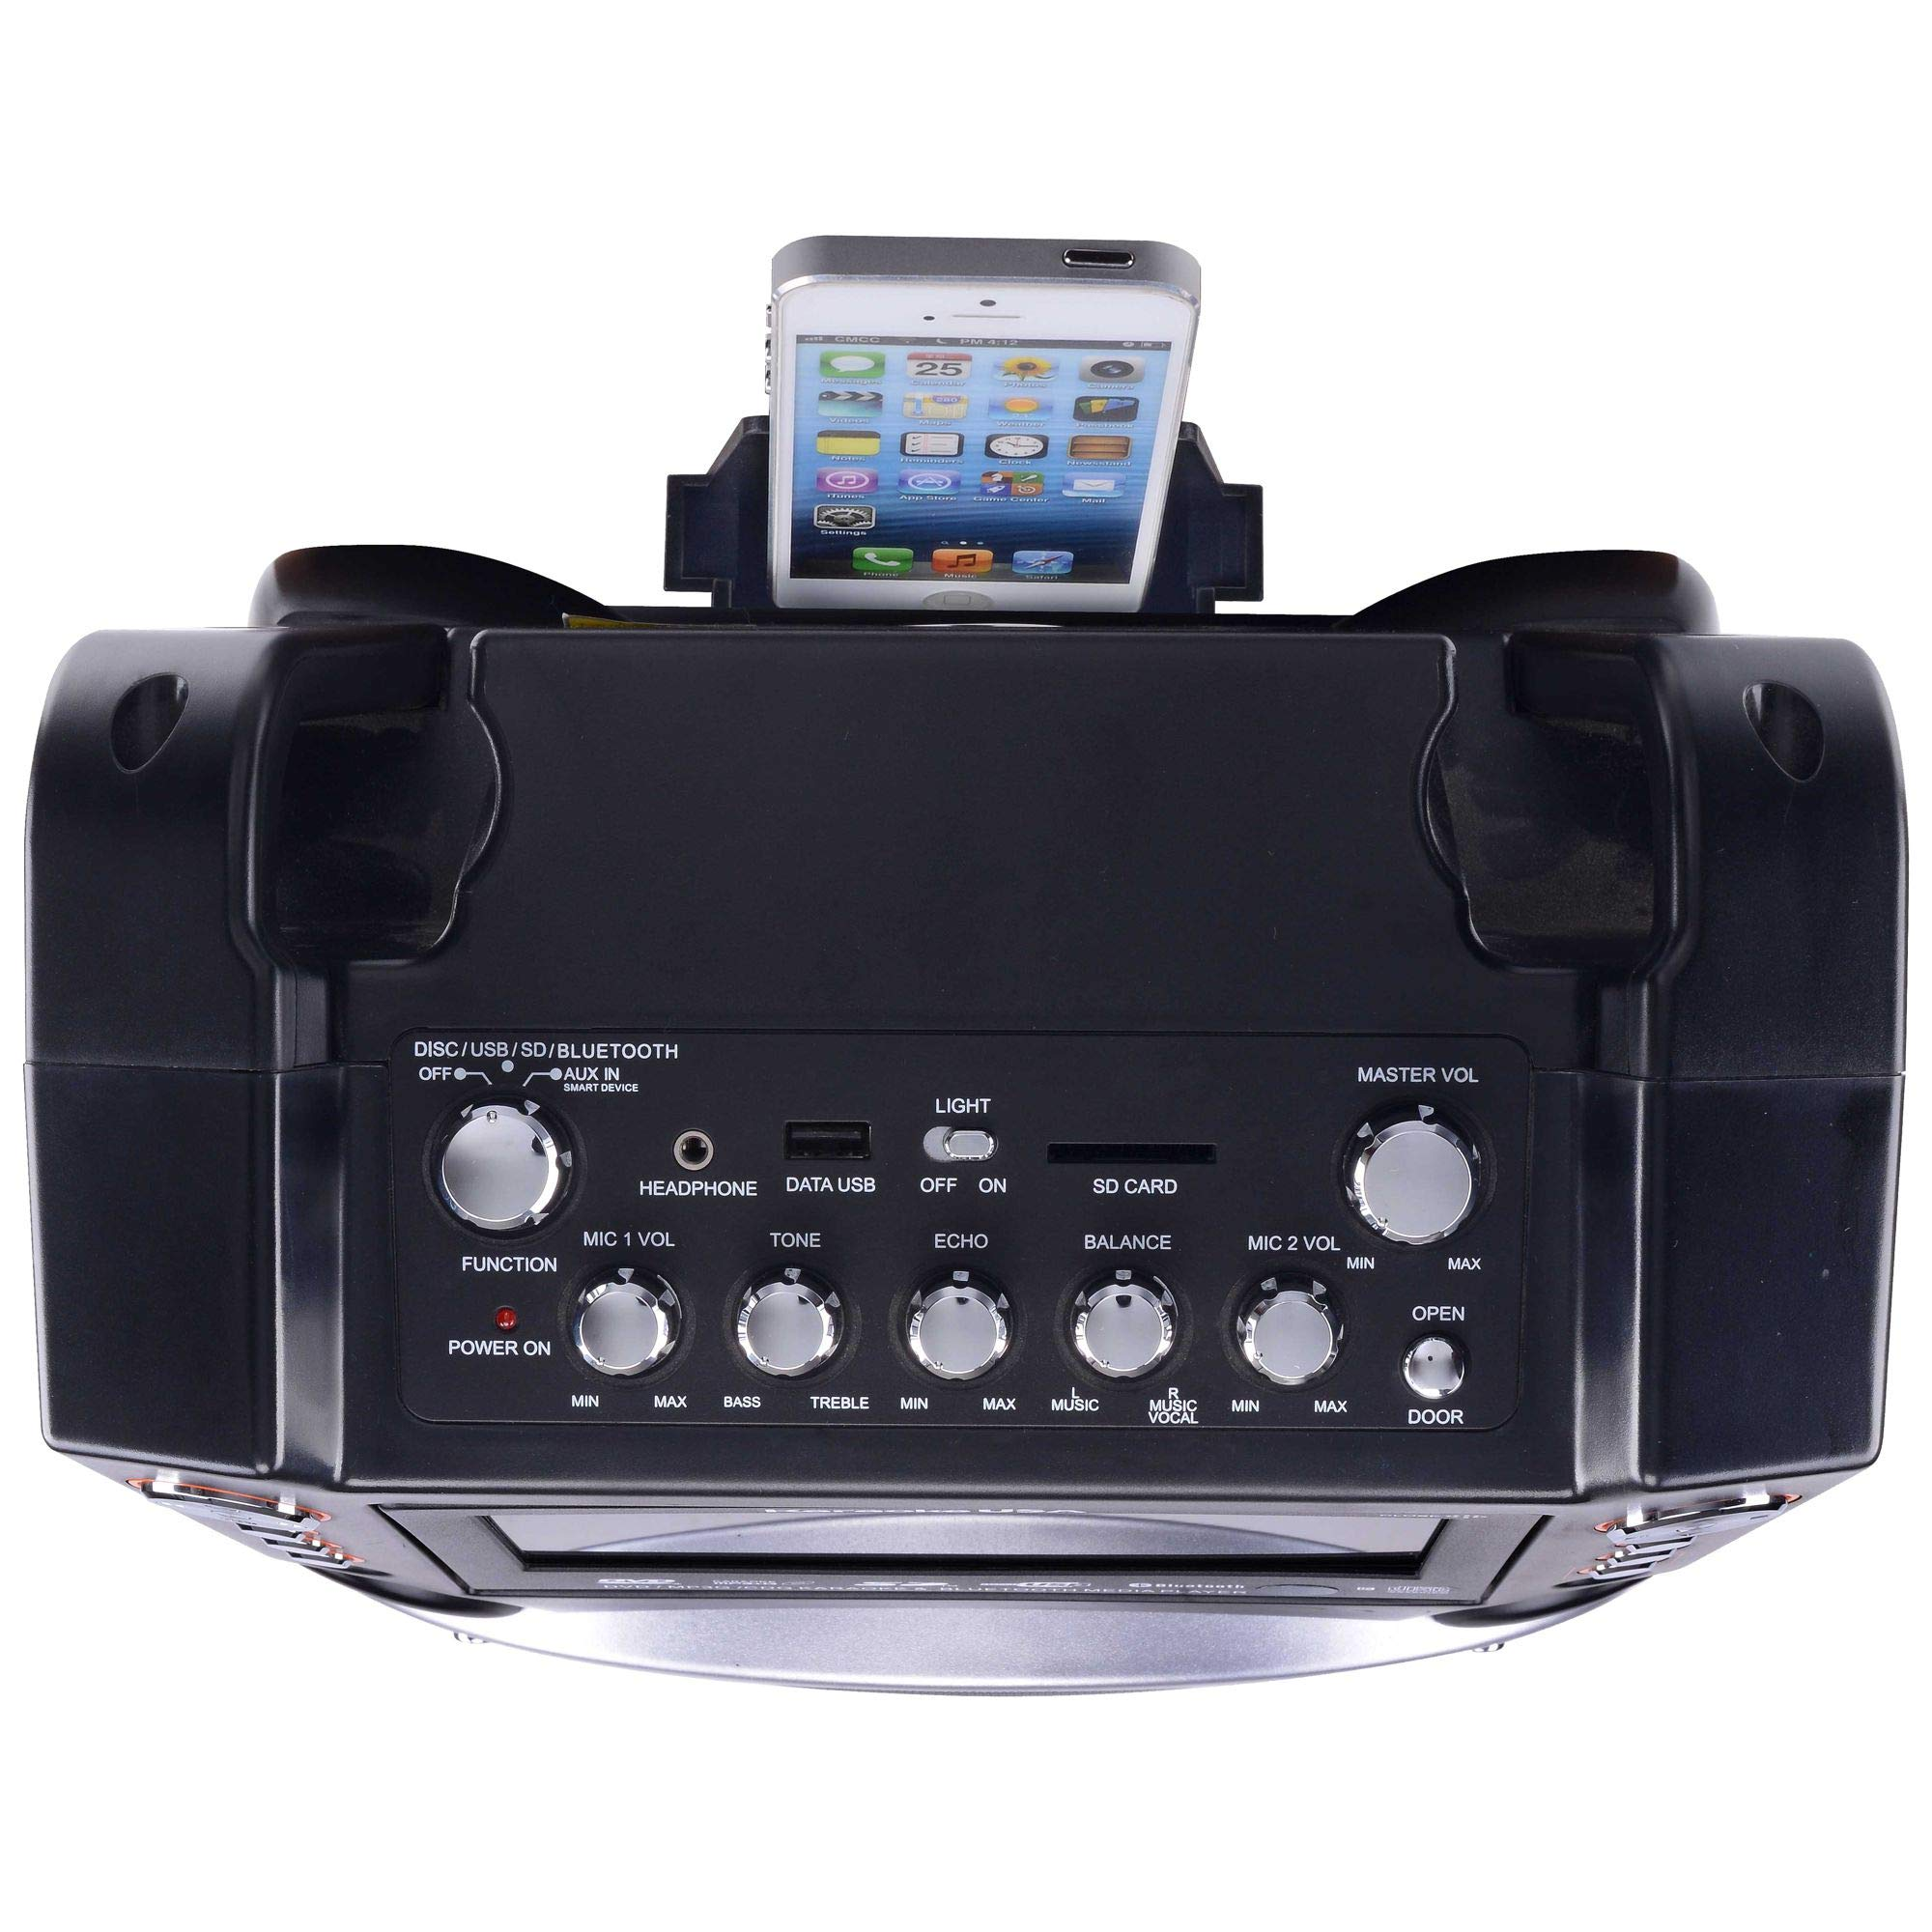 Karaoke USA GF846 DVD/CDG/MP3G Karaoke Machine with 7'' TFT Color Screen, Record, Bluetooth and LED Sync Lights by Karaoke USA (Image #12)